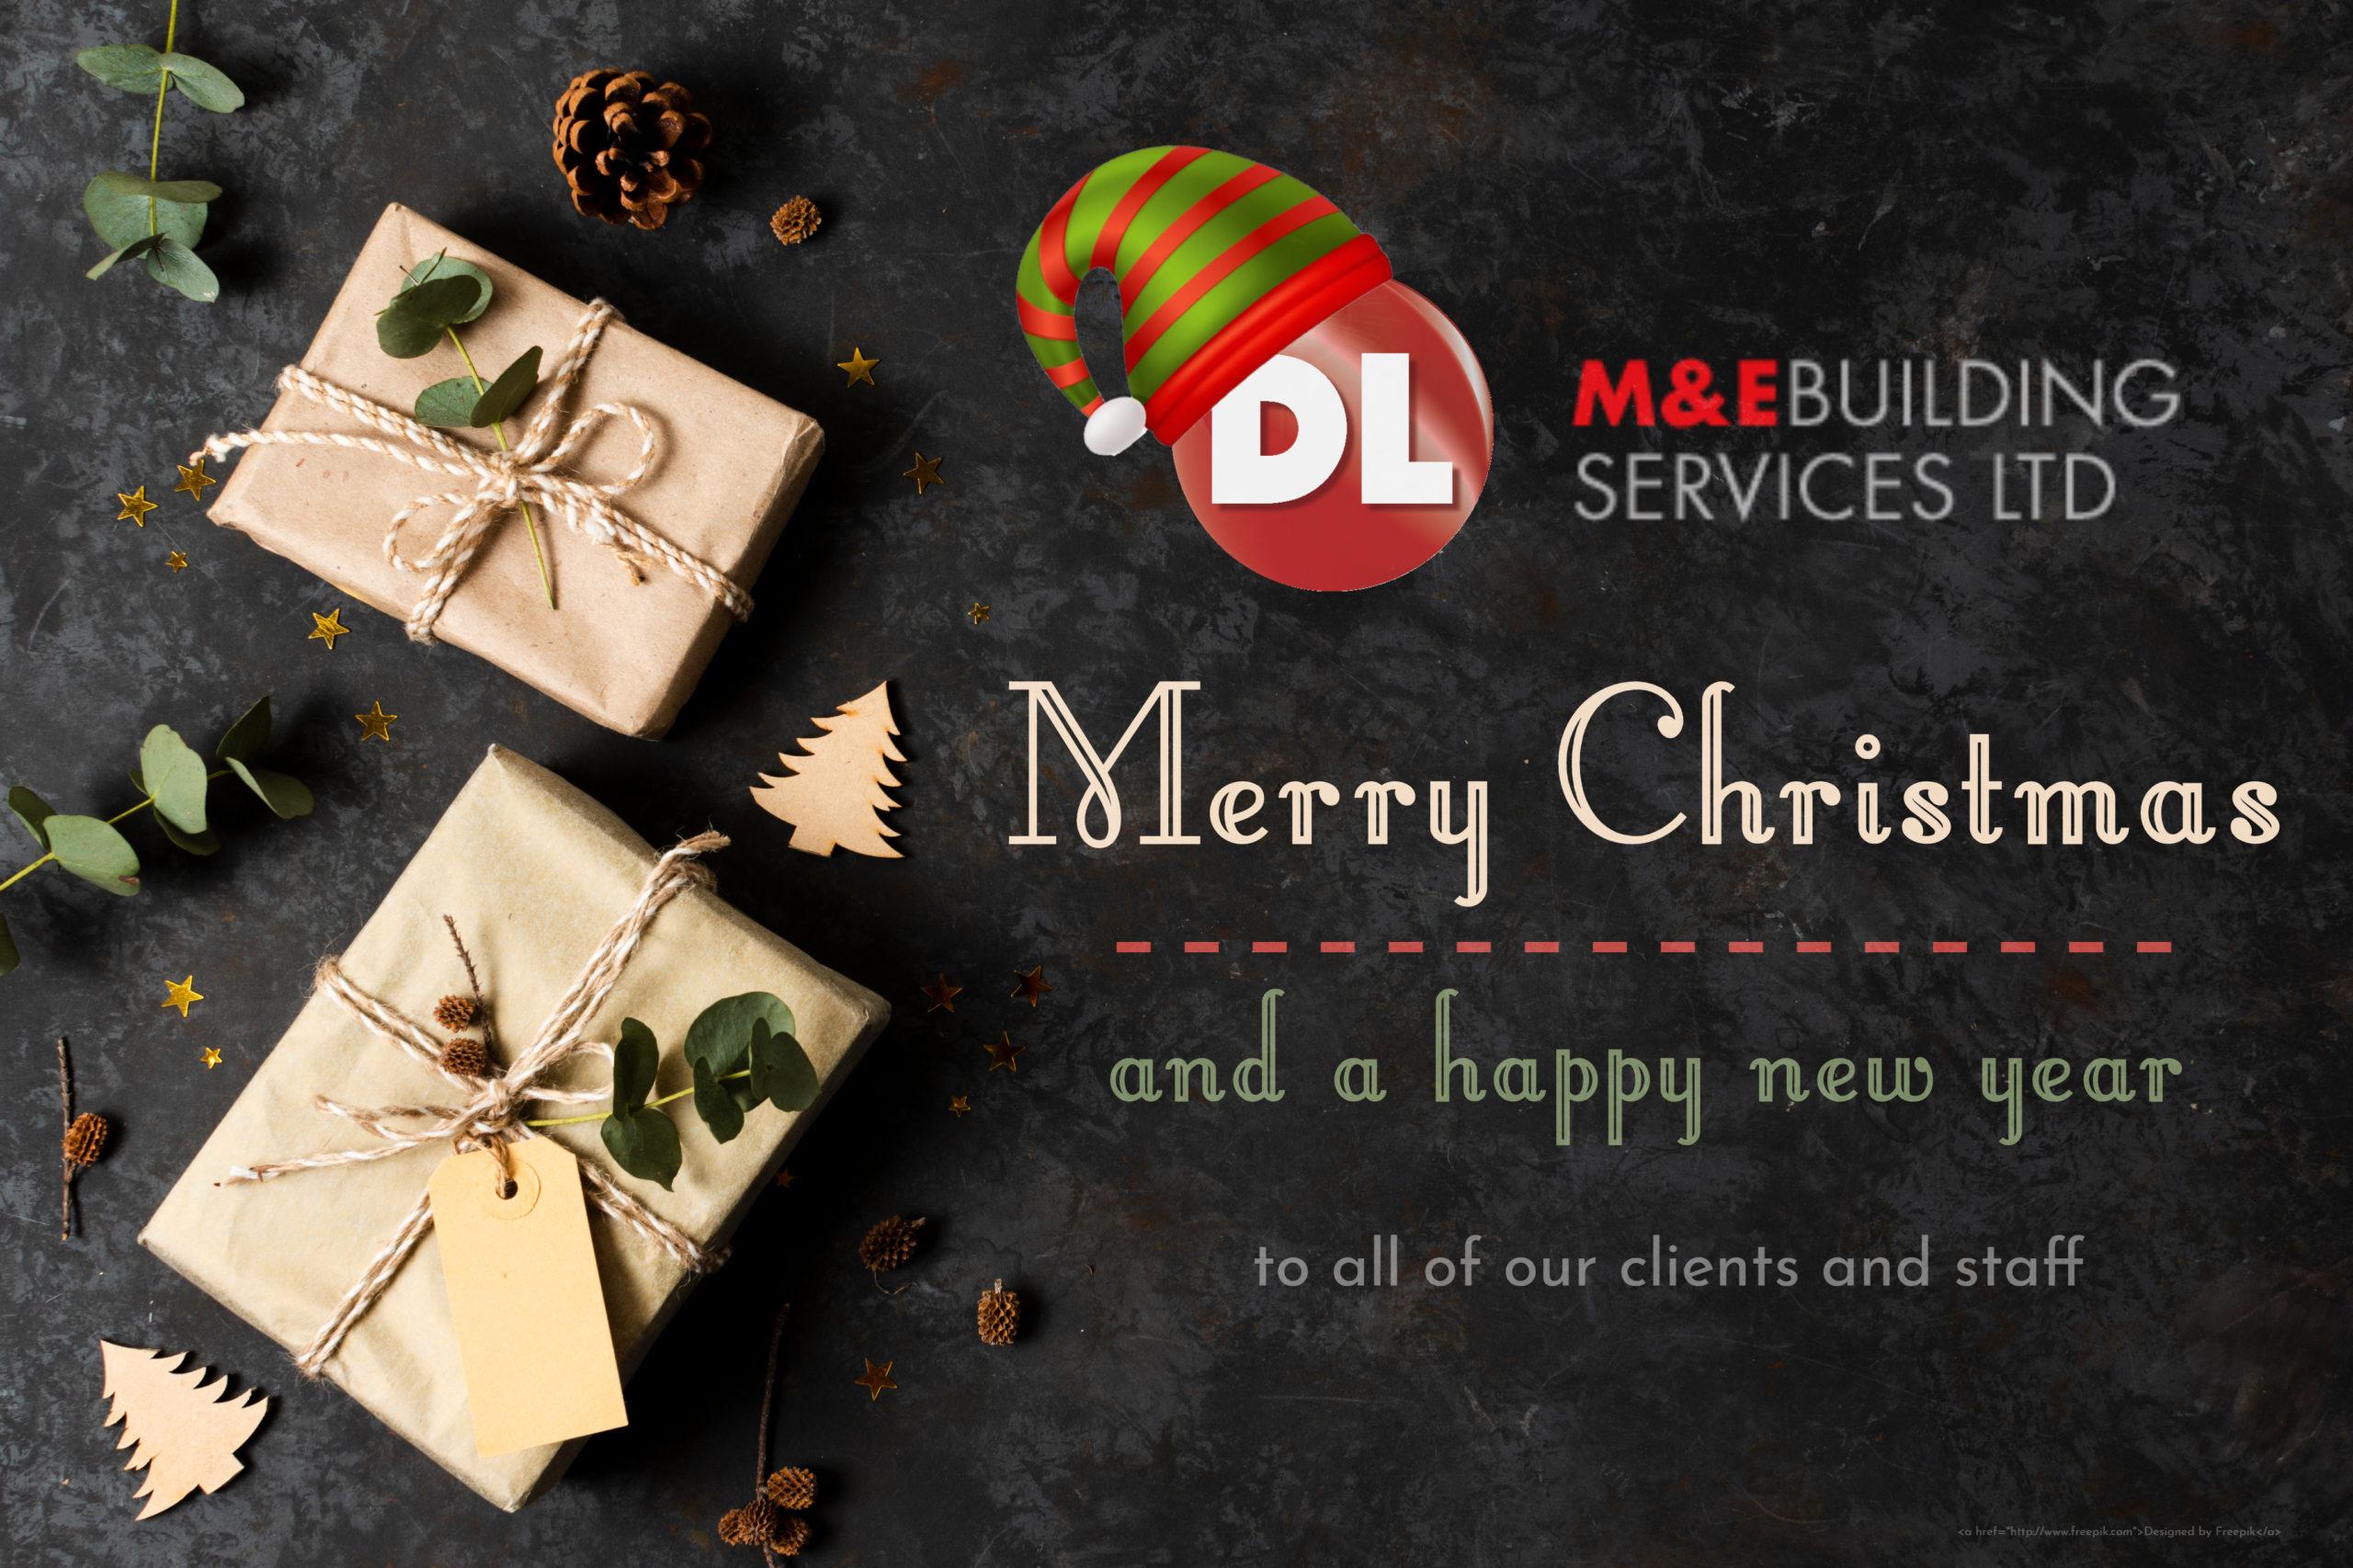 A Message of Gratitude from DL M&E - DL M&E Building Services